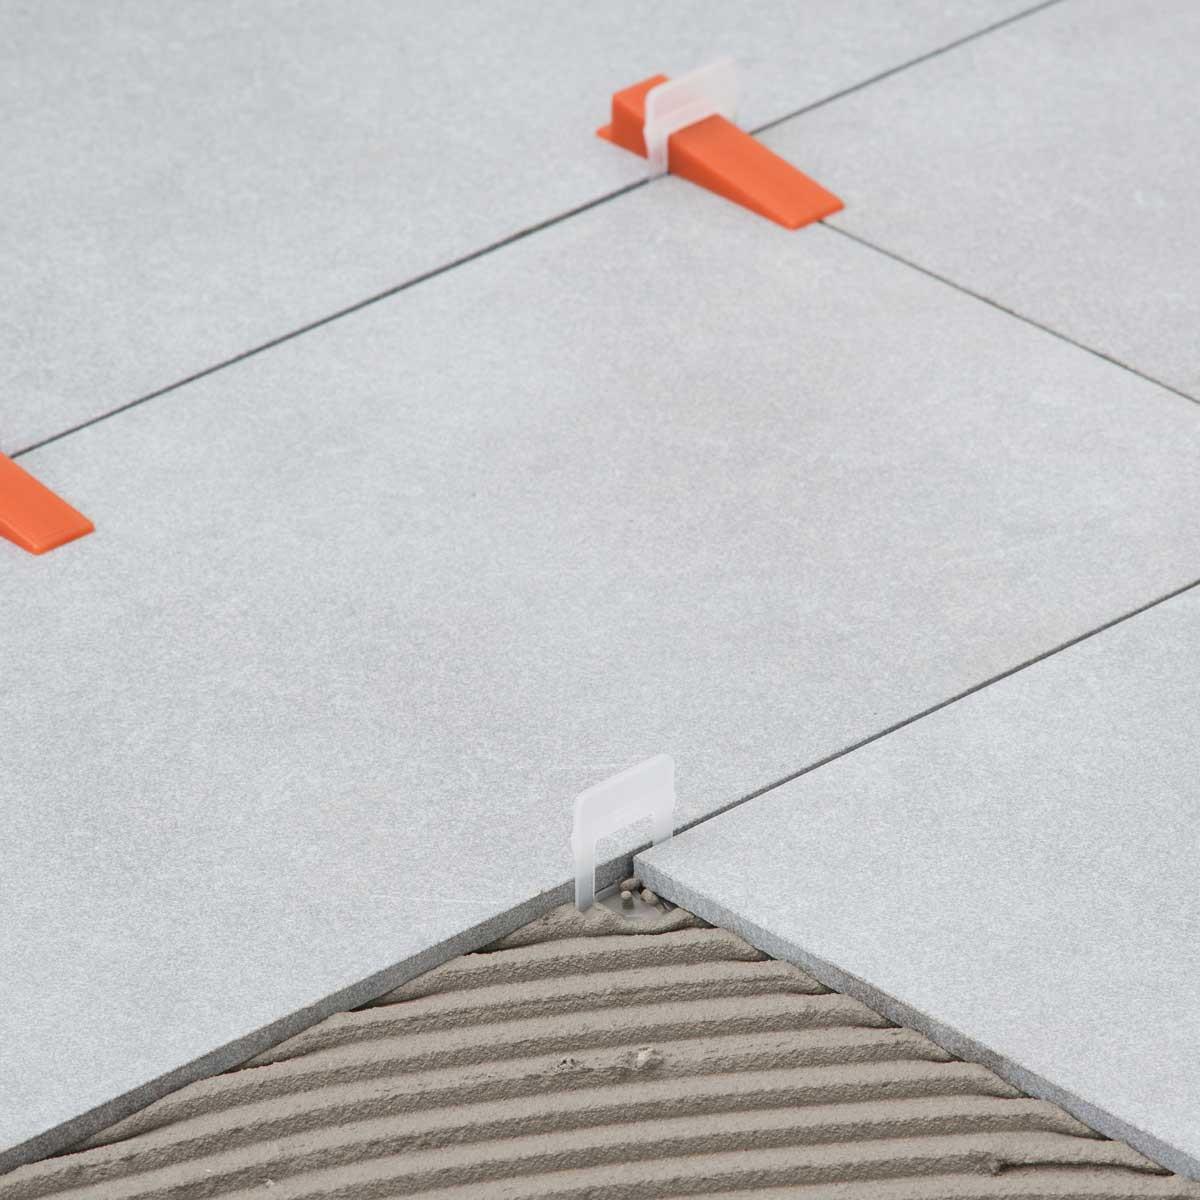 raimondi 1/16in large white clip layout